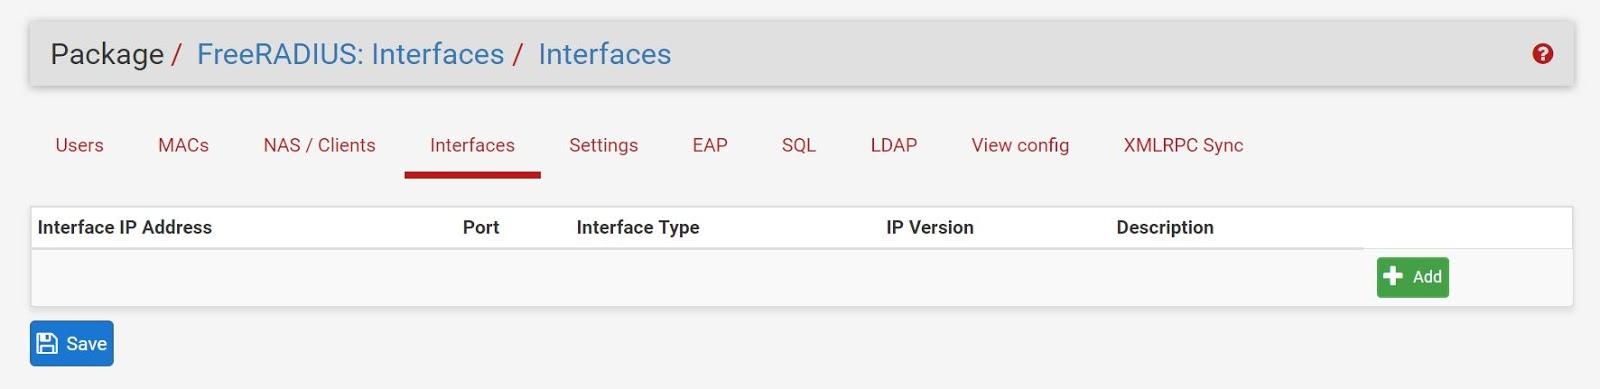 pfSense OpenVPN Setup with FreeRadius3 2fa Authentication